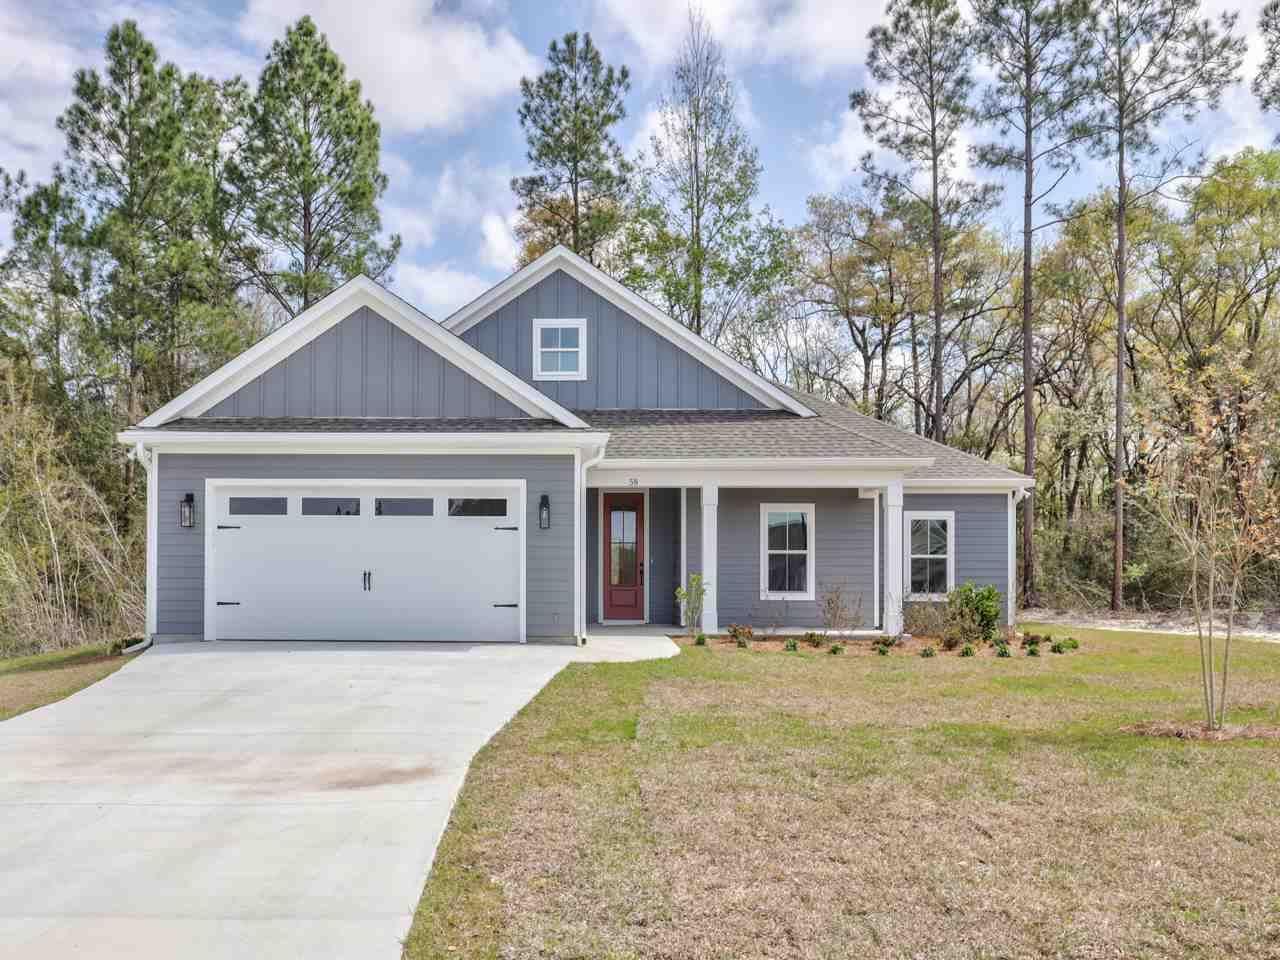 38 Stillmont Drive, Crawfordville, FL 32327 - MLS#: 333896